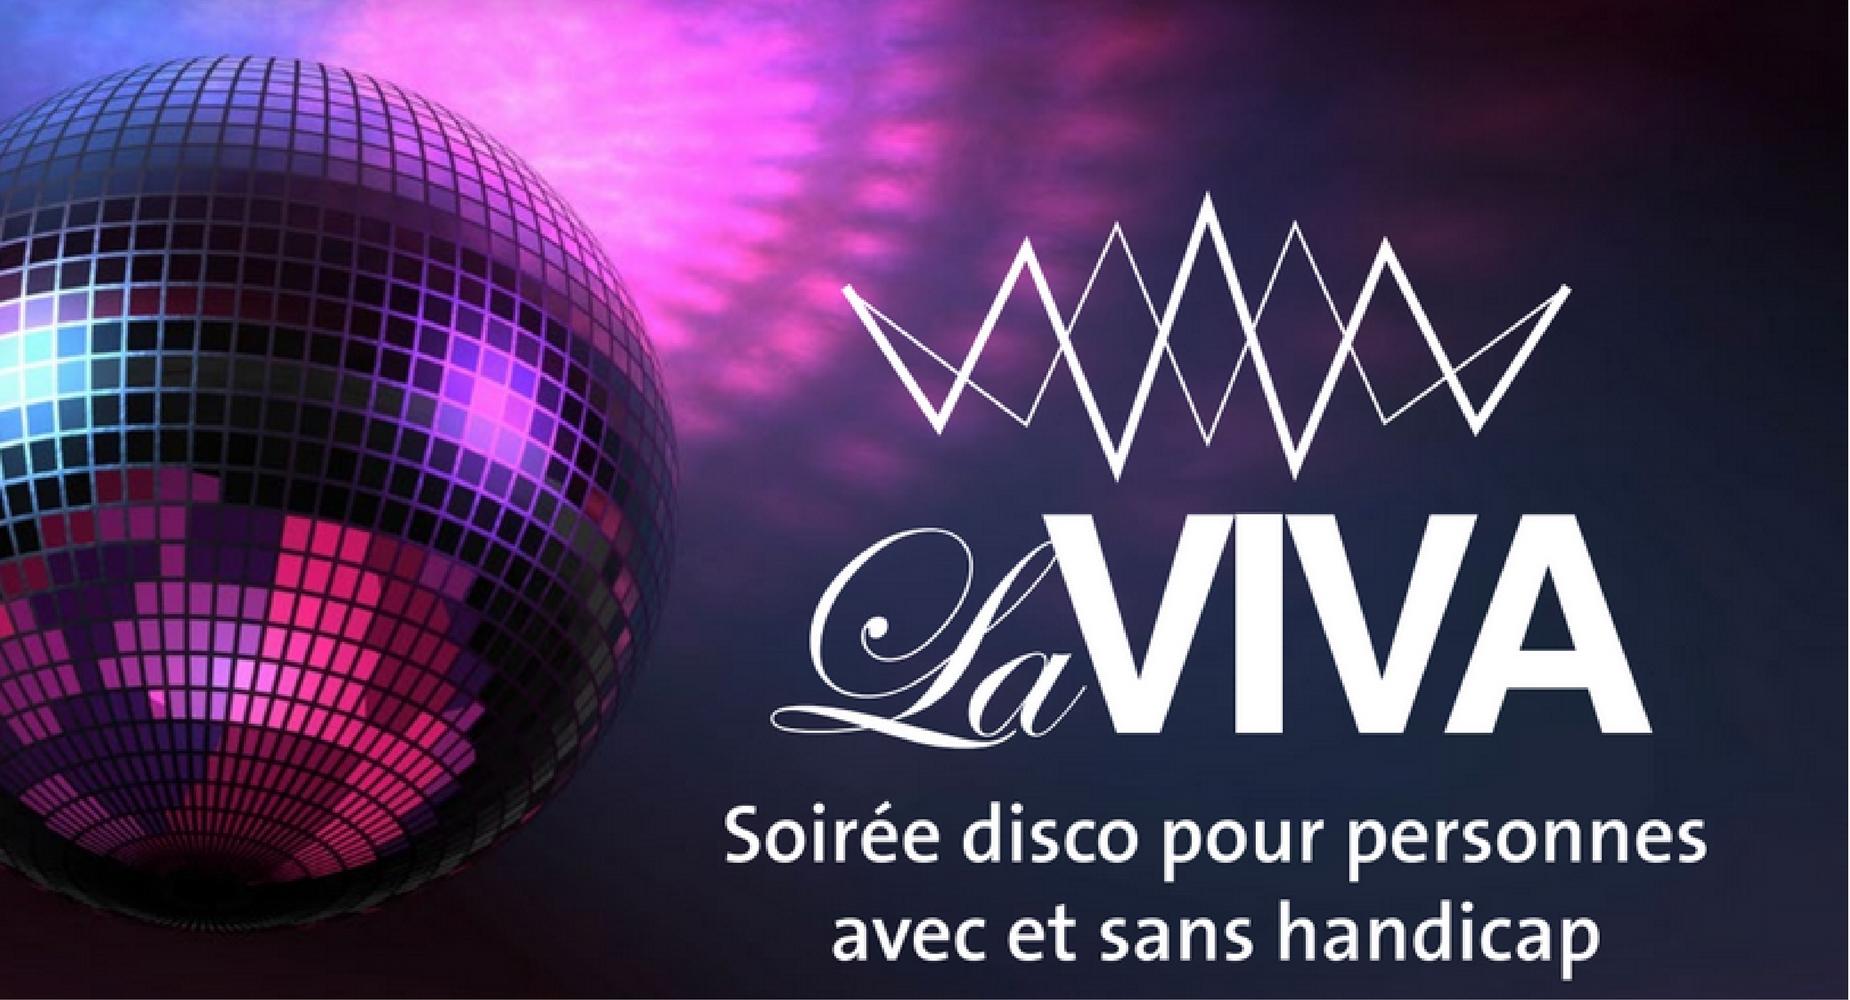 Soirée disco LaViva